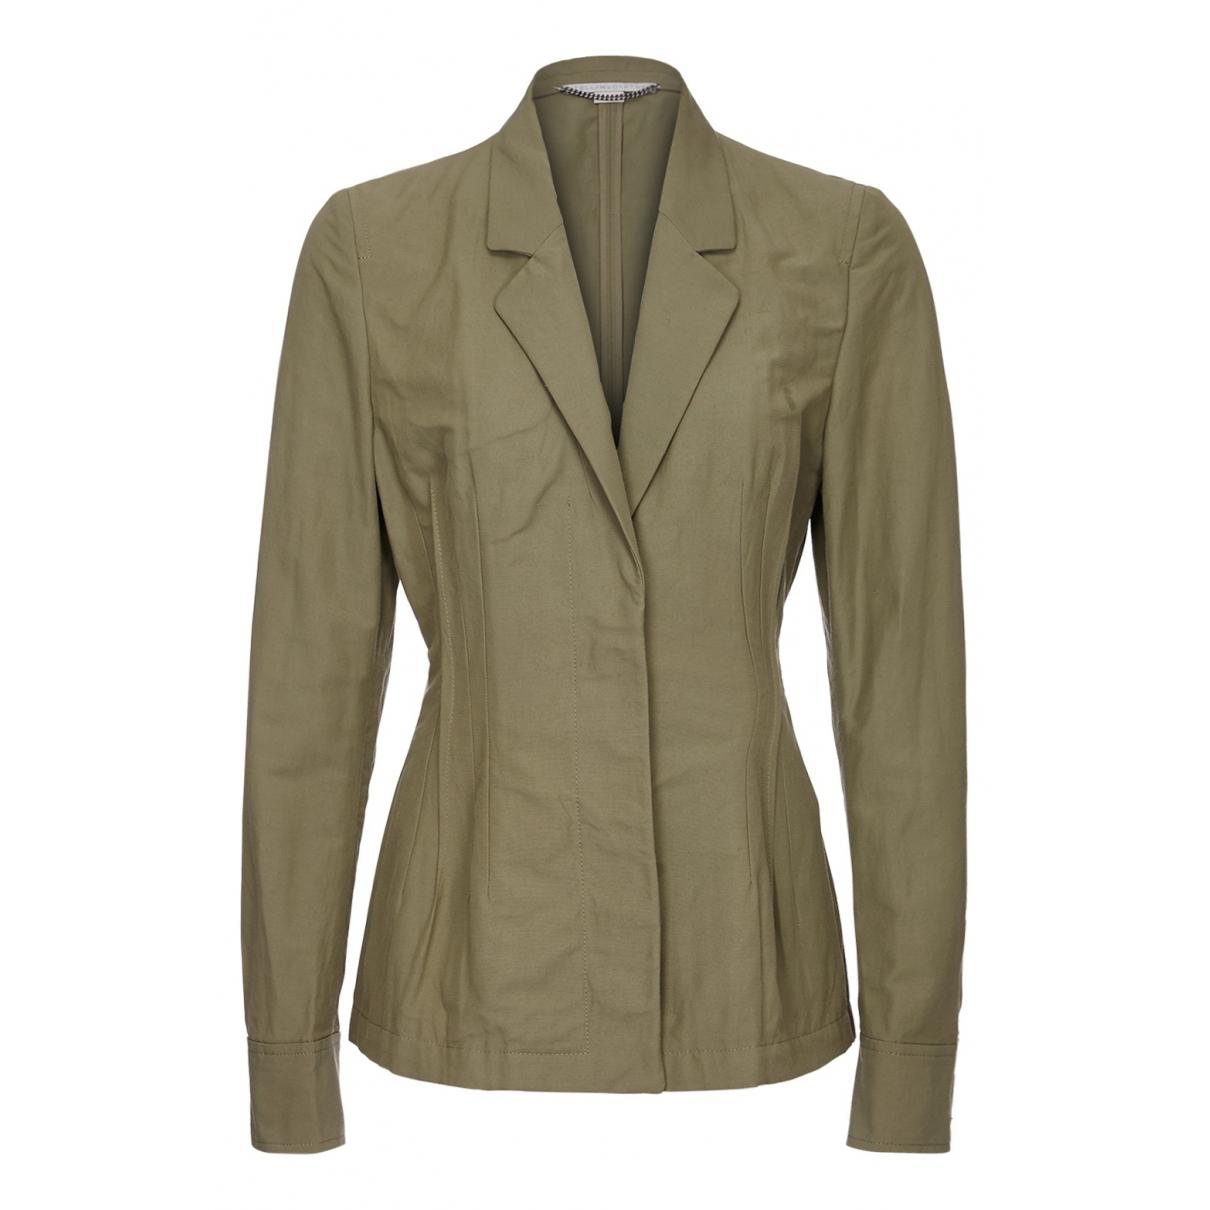 Stella Mccartney N Green Cotton jacket for Women 10 UK